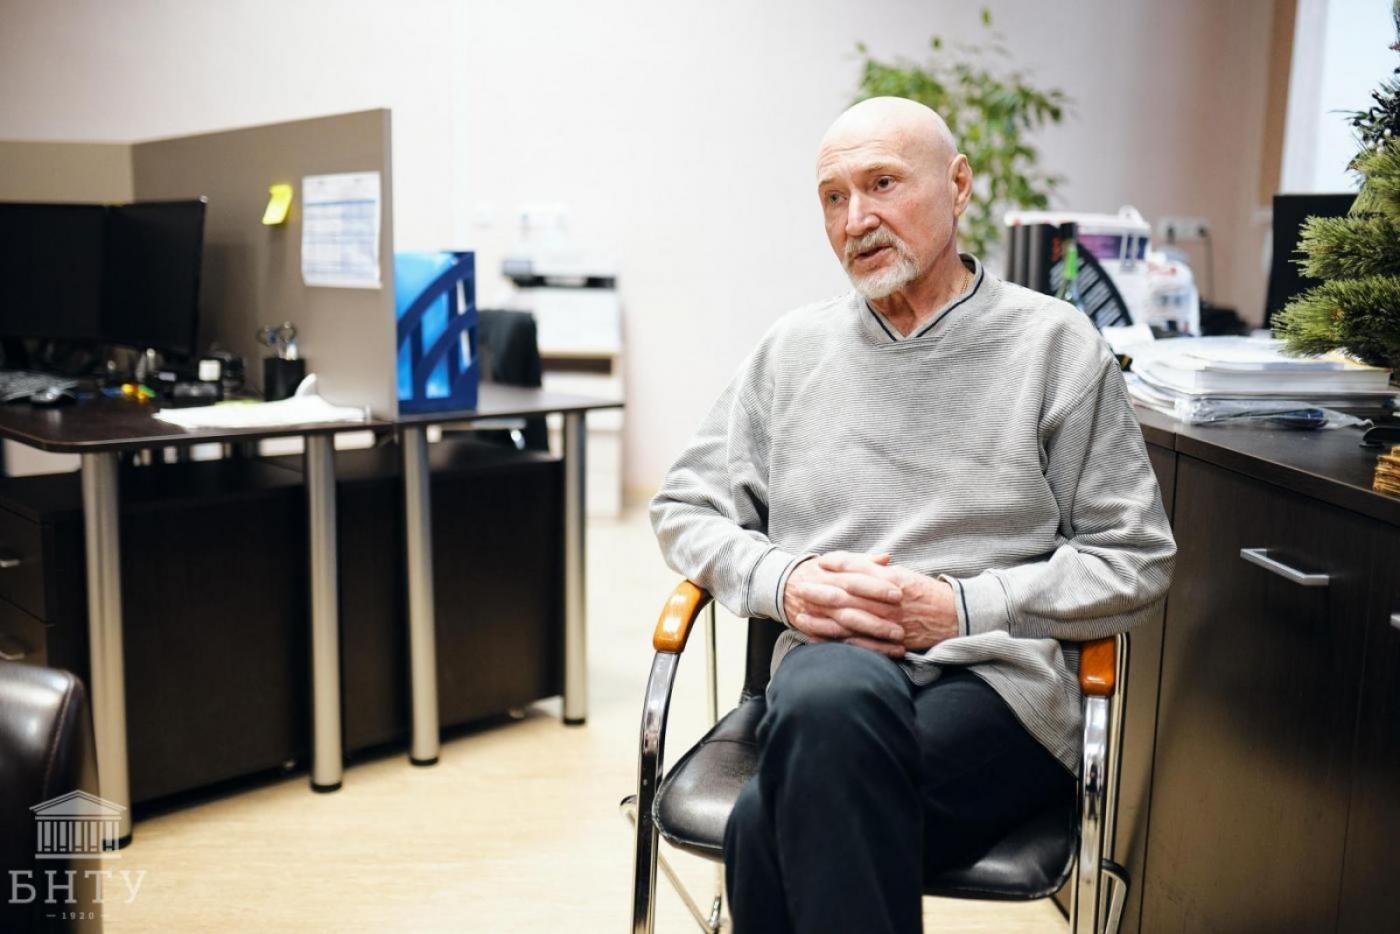 Знакомим с резидентами технопарка: Центр адаптивной кинезитерапии